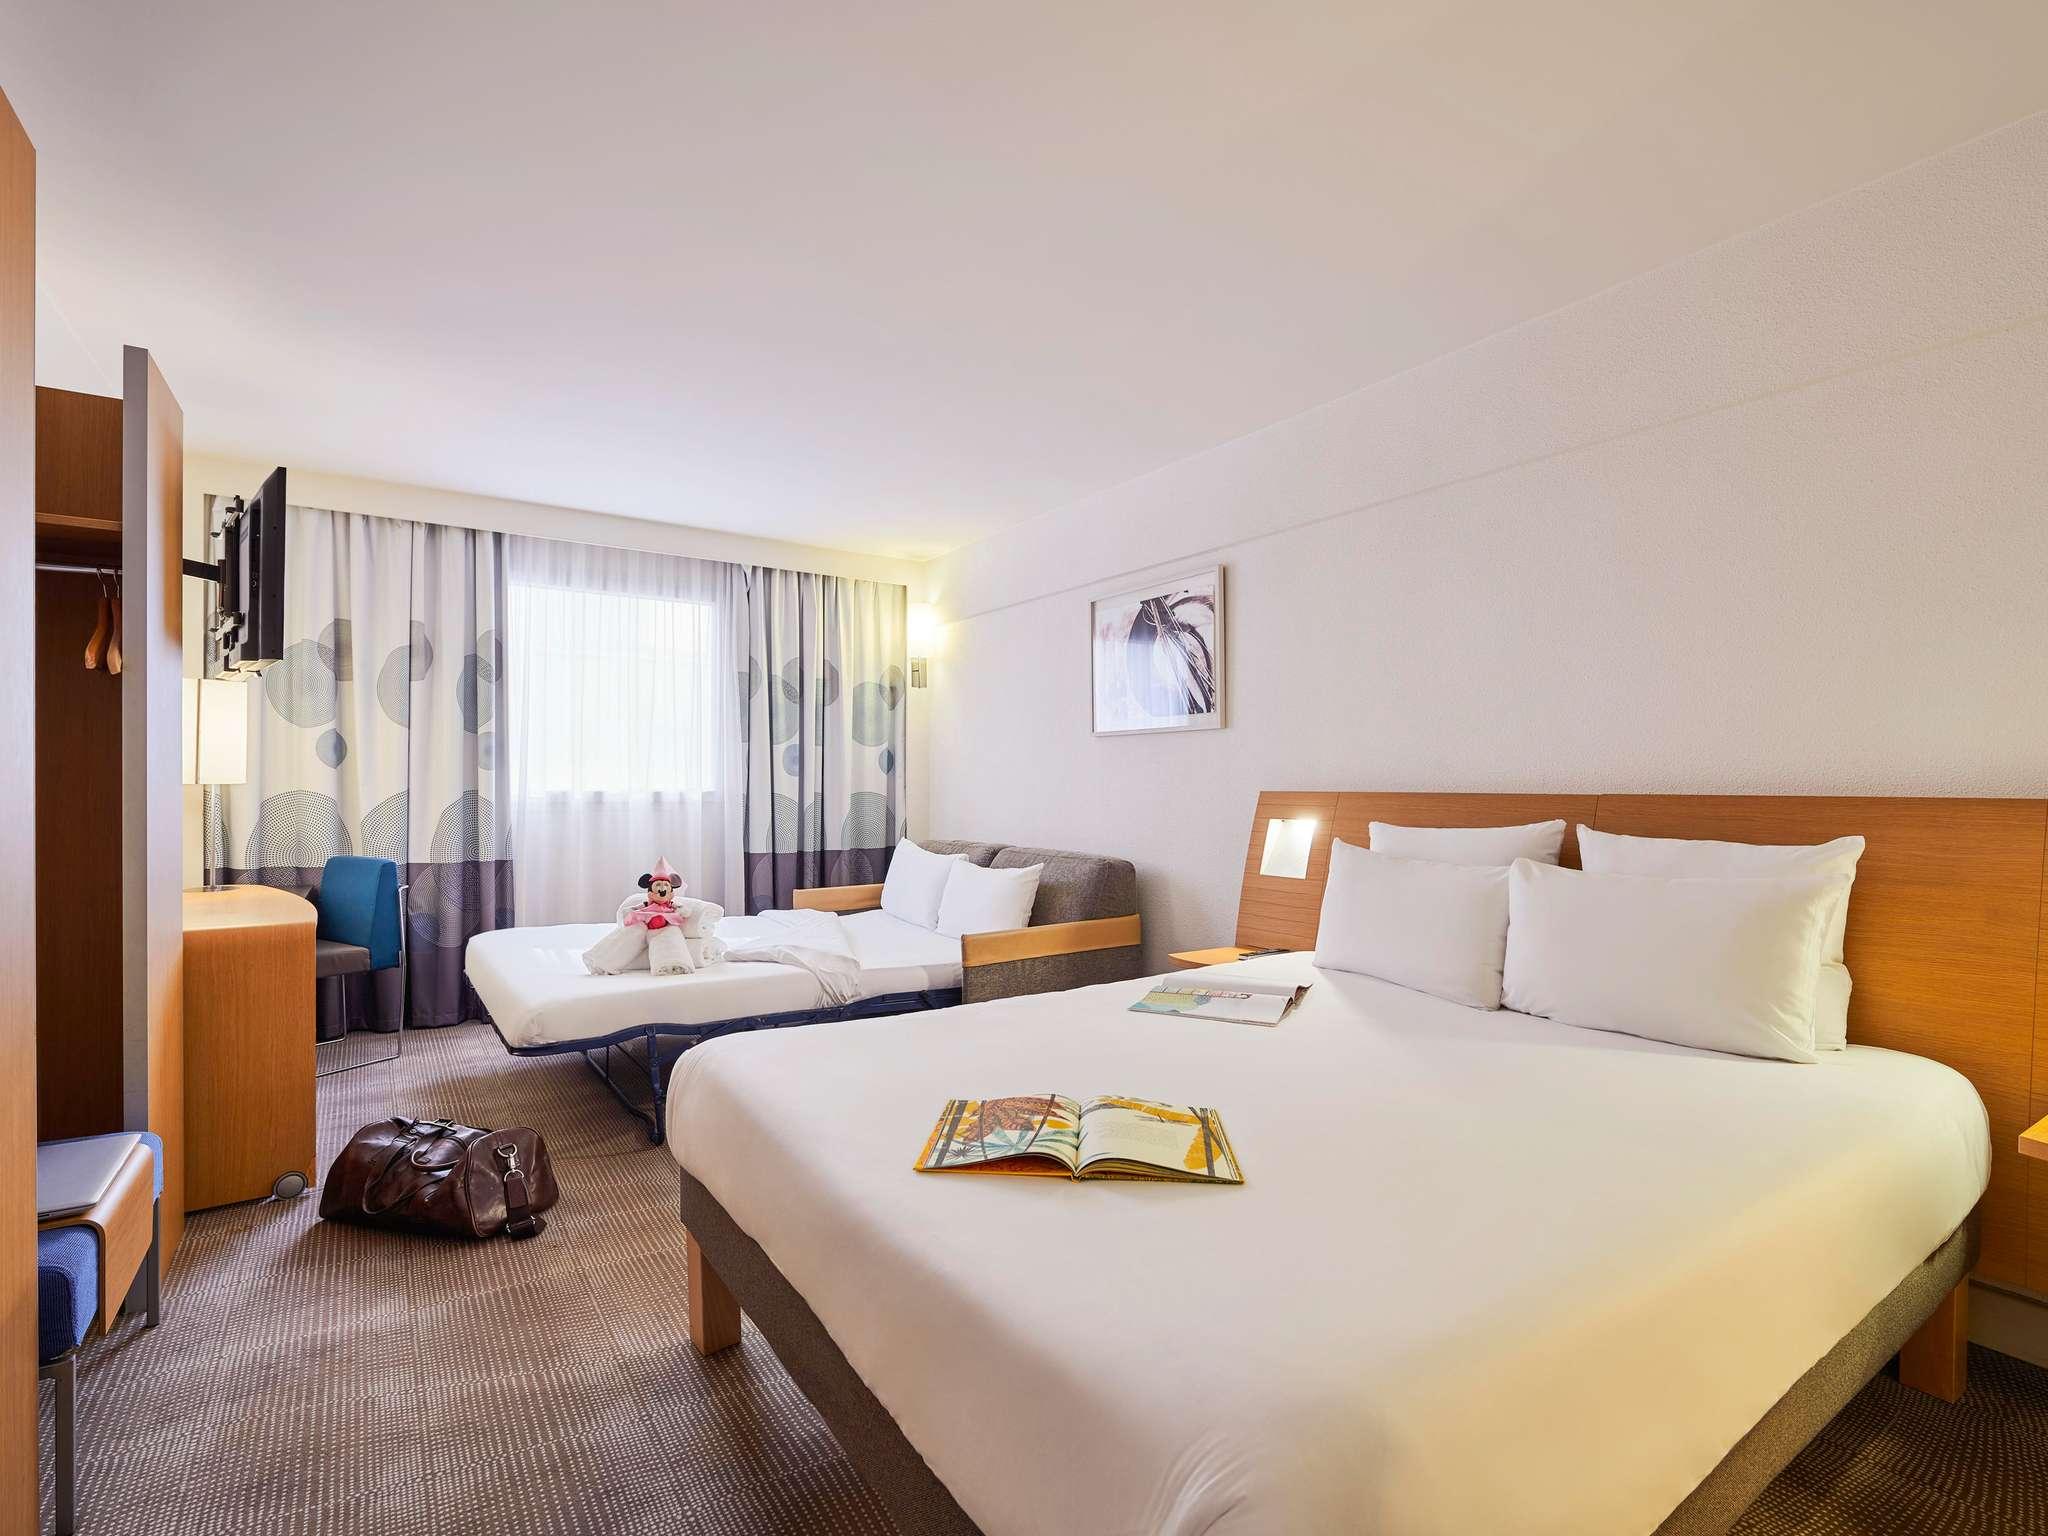 Hotel in LE KREMLIN BICETRE - Novotel Paris 13 Porte d\'Italie